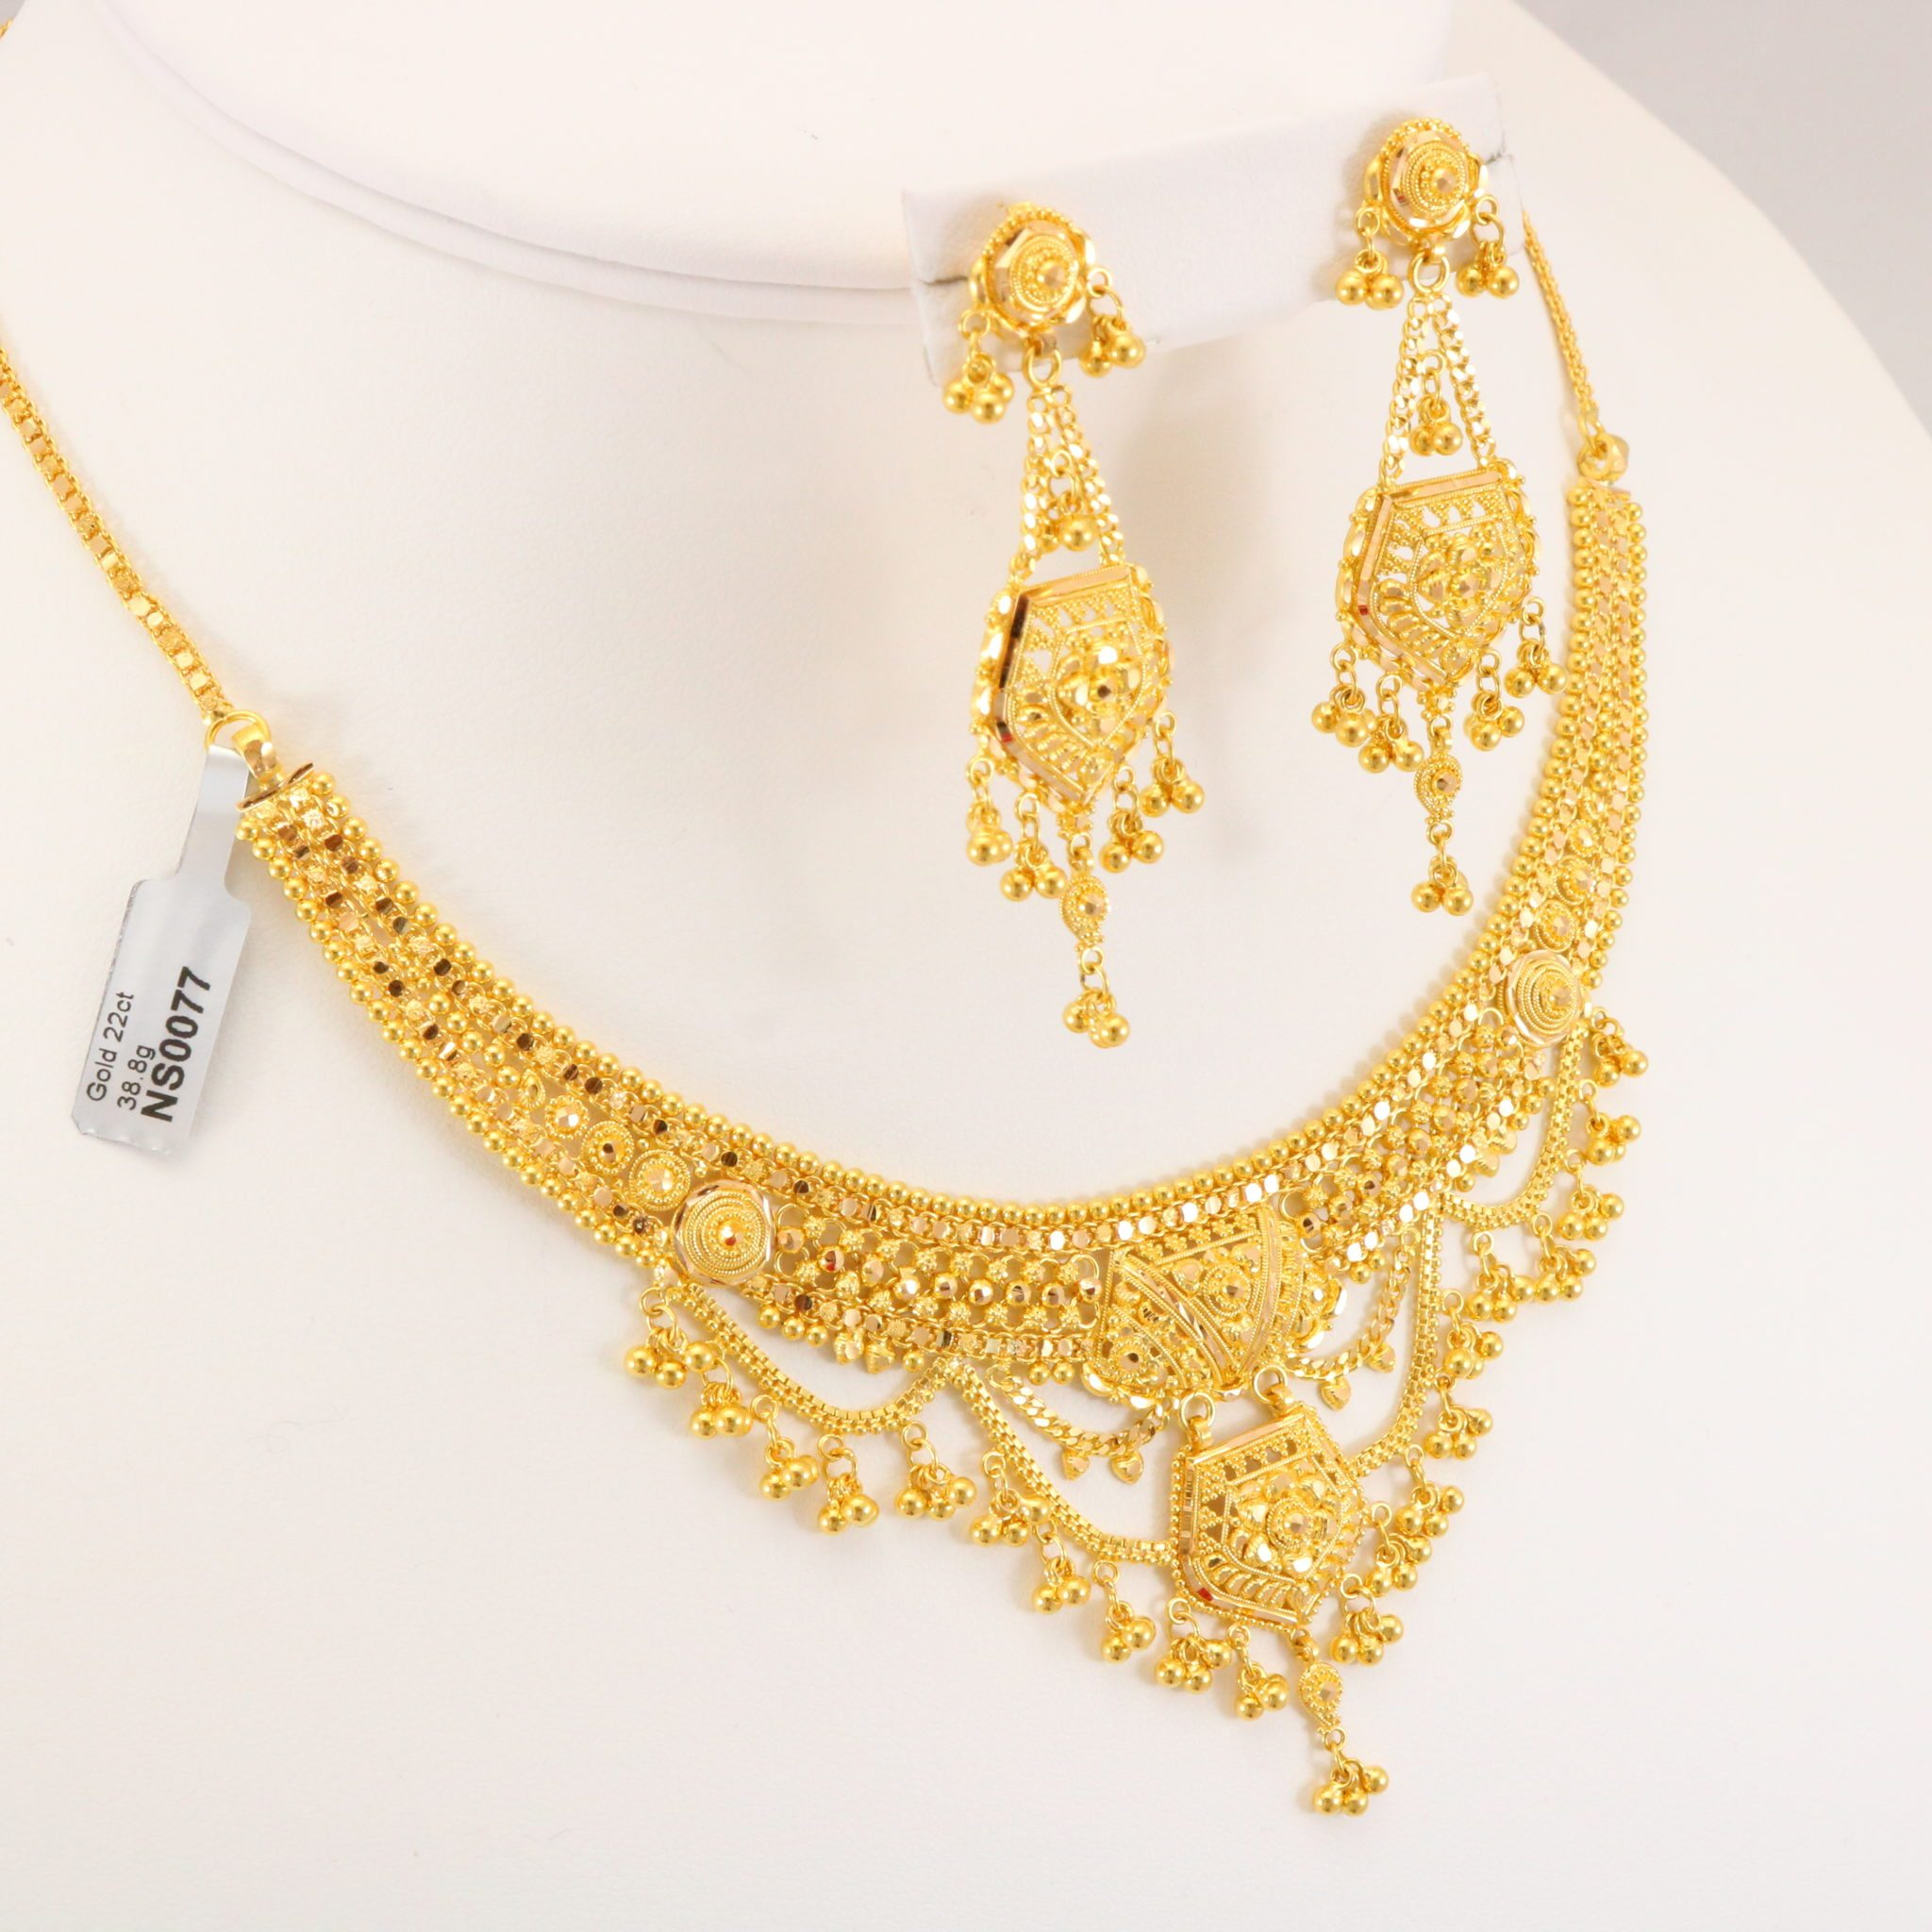 Carat Diamond Necklace Price